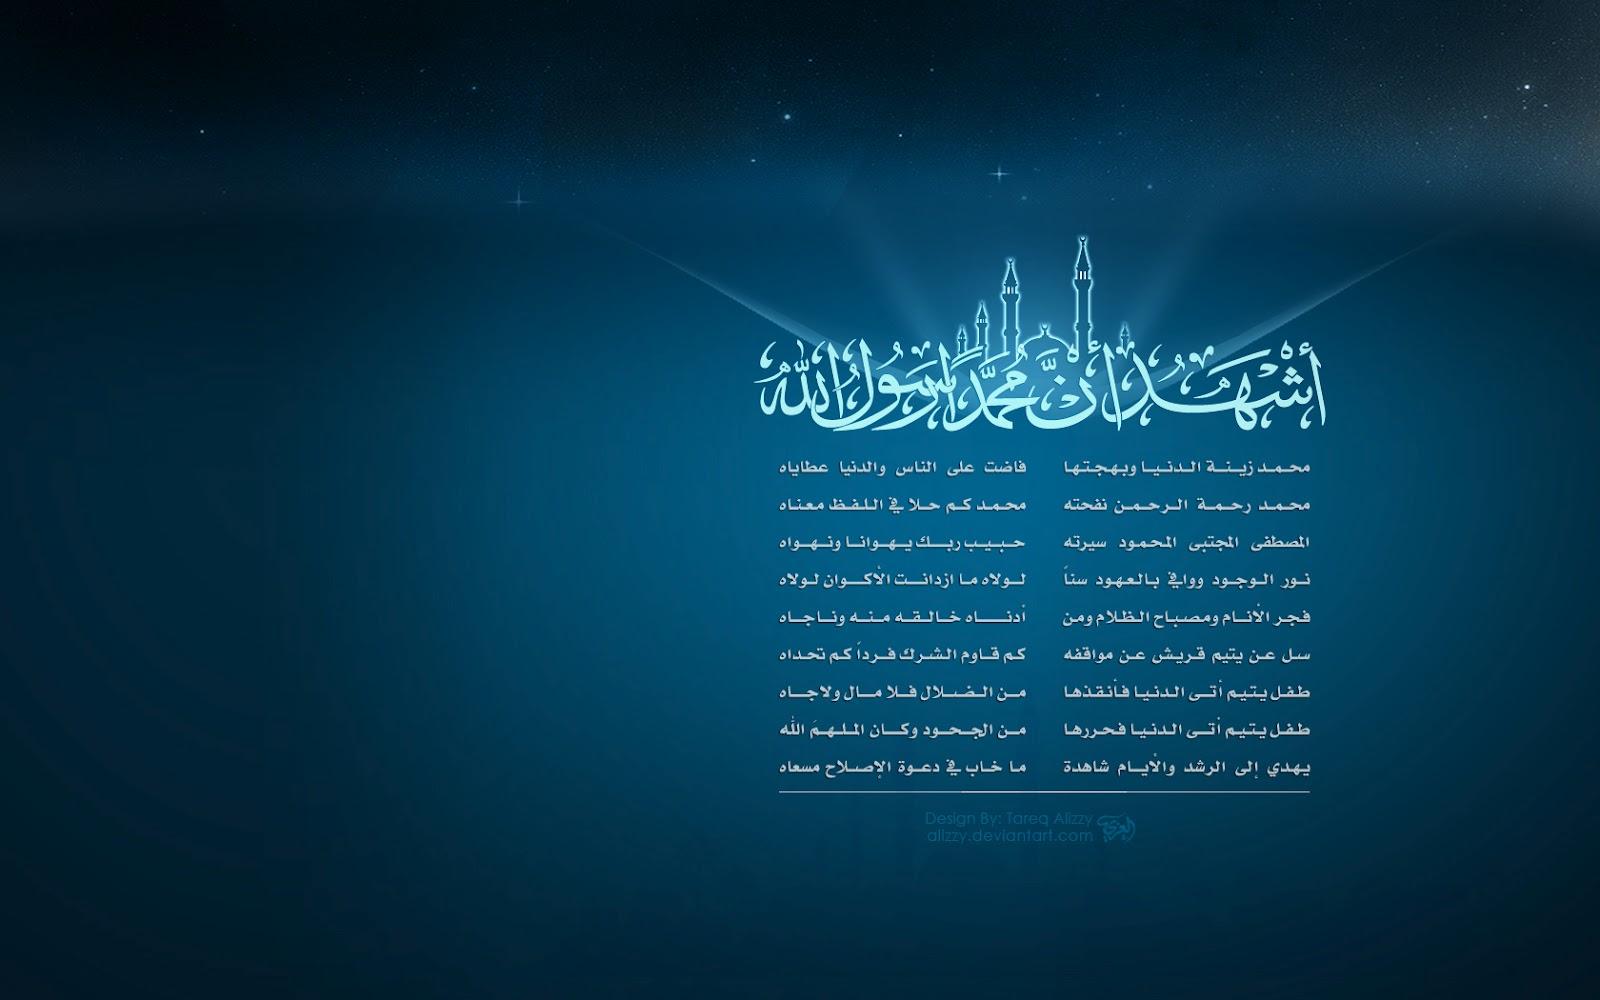 islami 1024x768 wallpaper islami 1152x864 wallpaper islami 1280x800